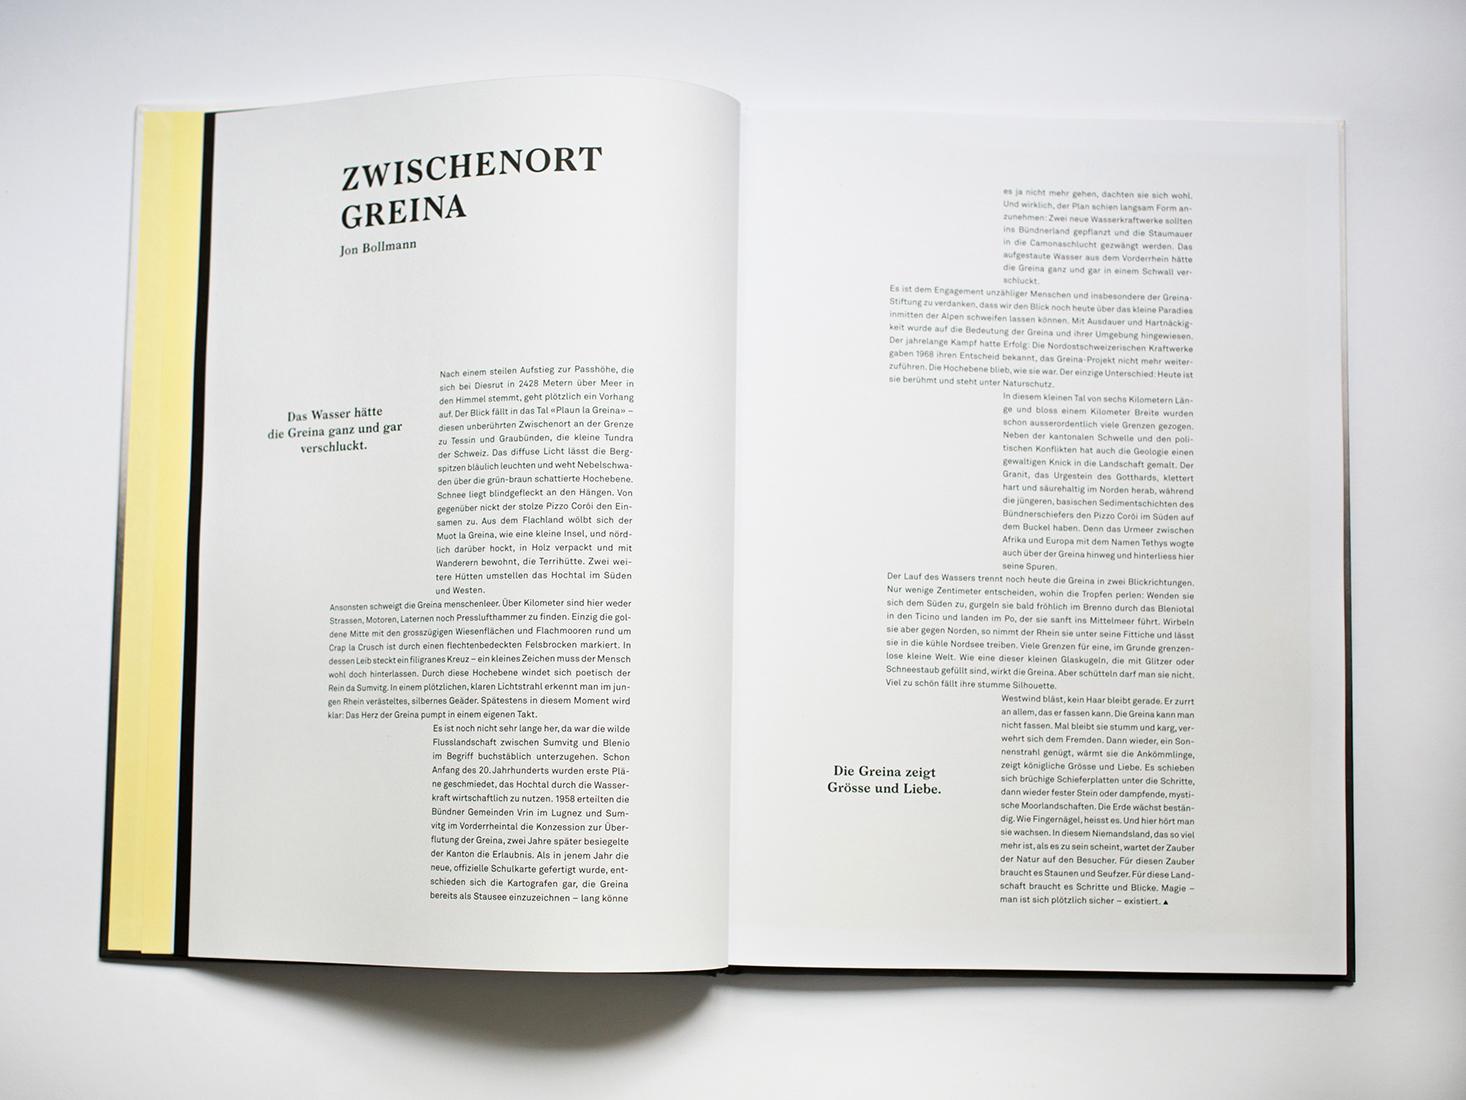 Greina_21